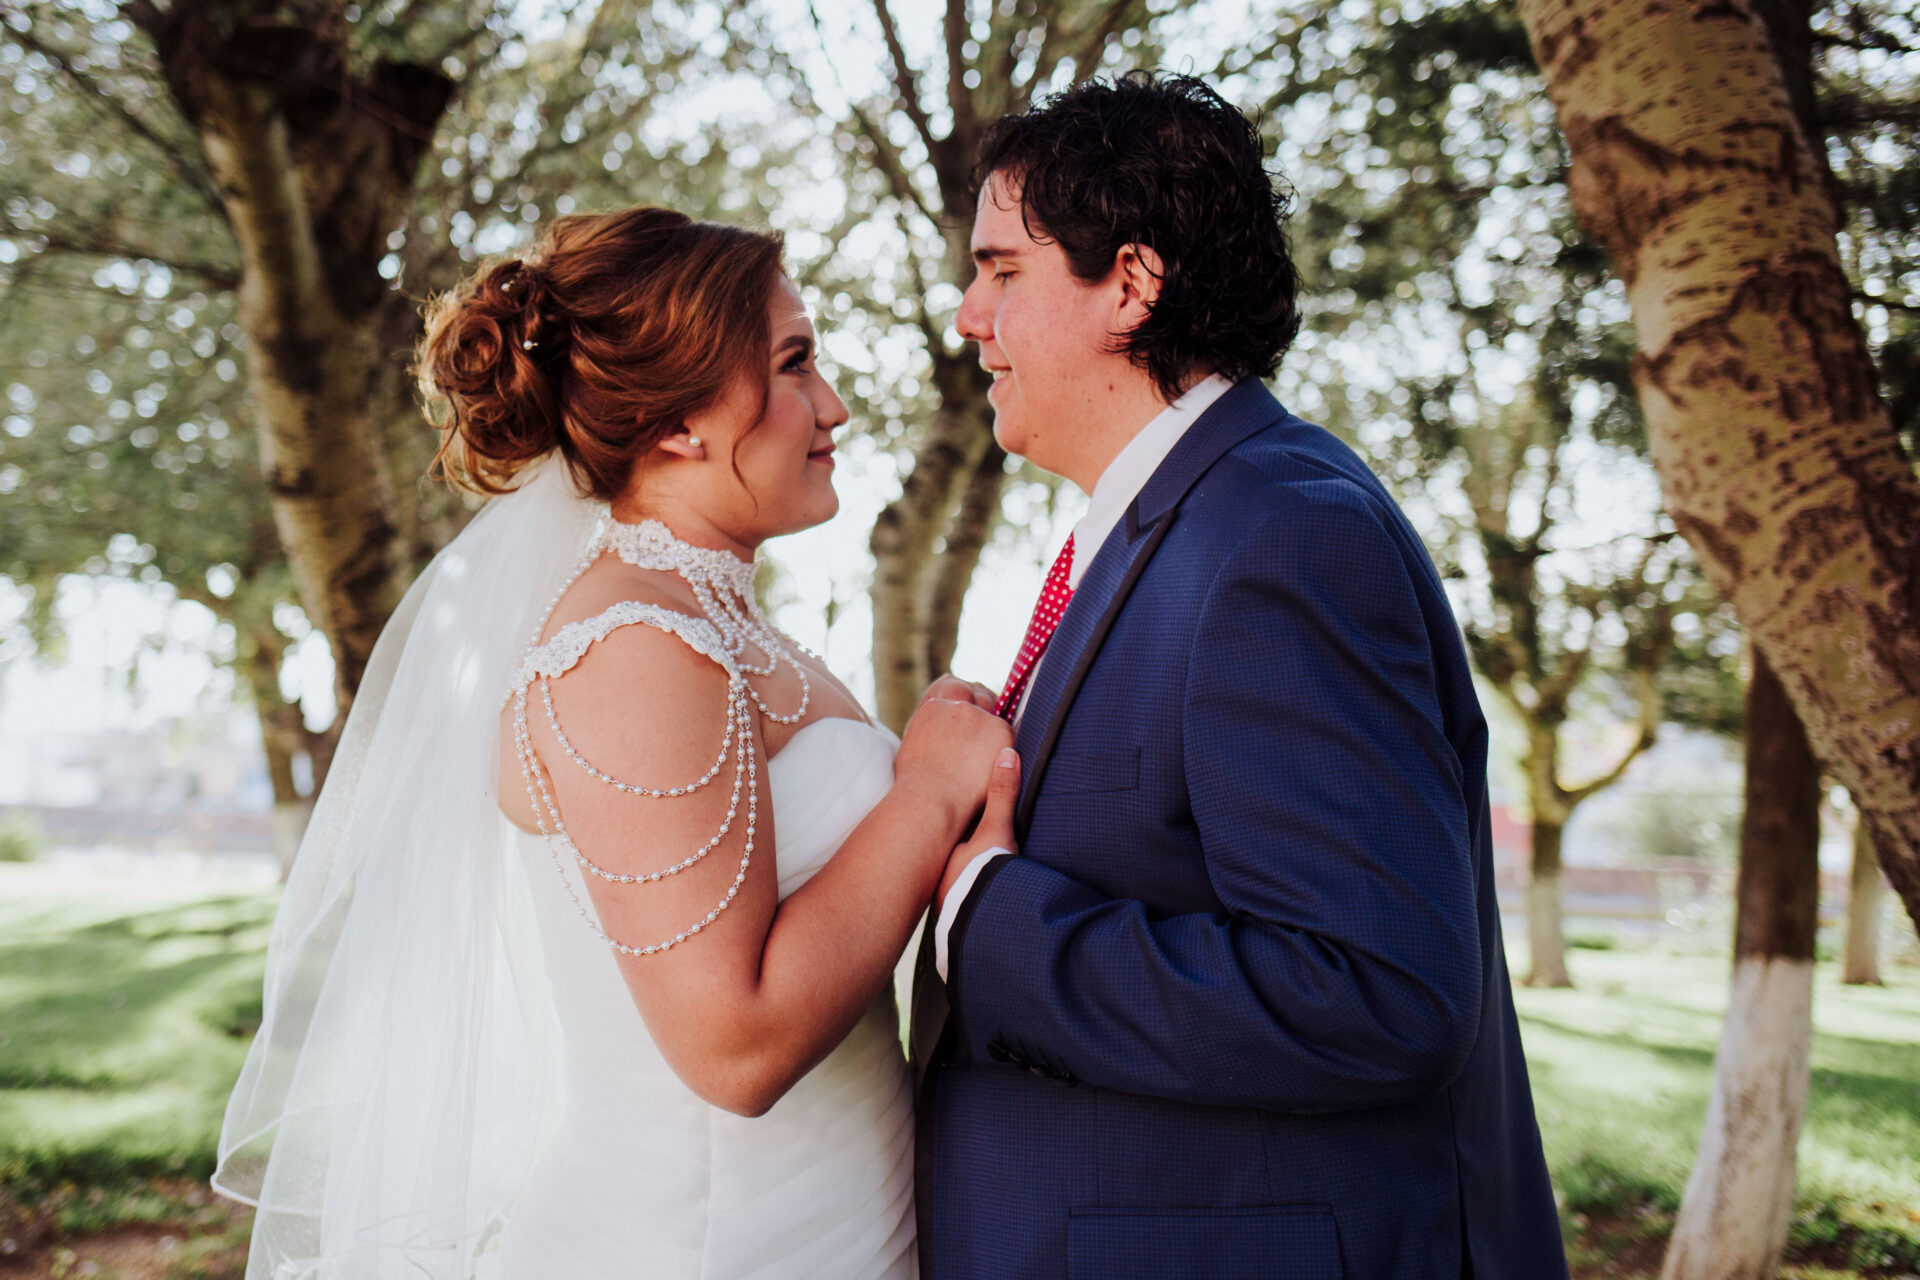 javier_noriega_fotografo_bodas_gaviones_zacatecas_wedding_photographer13